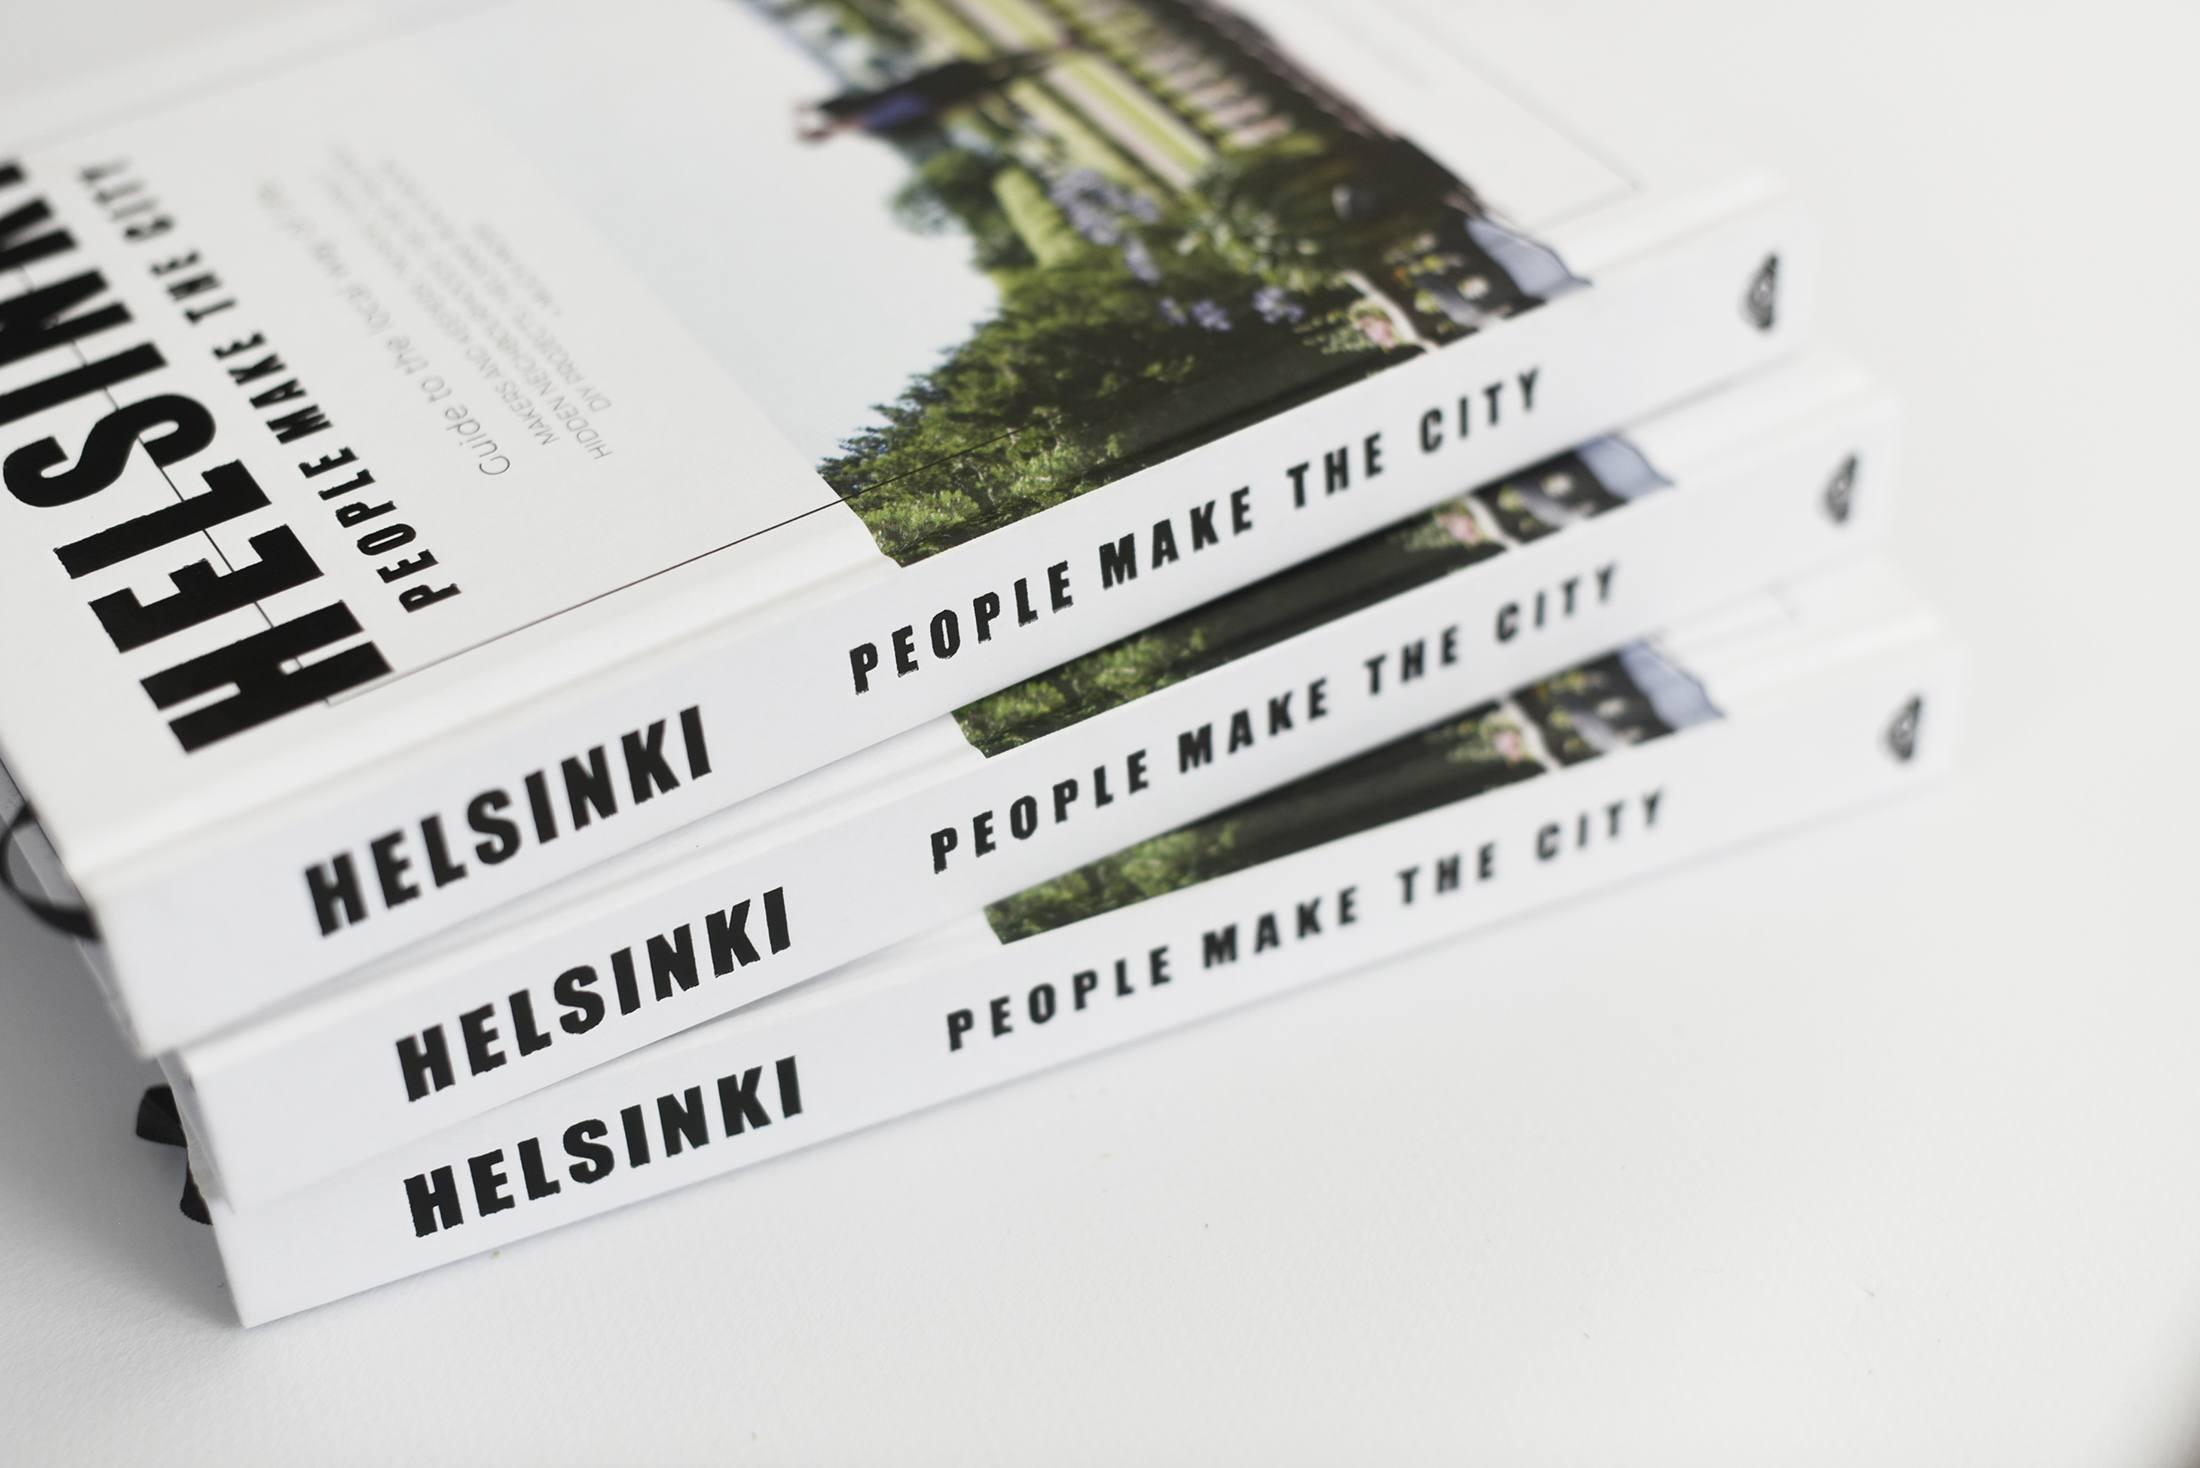 Helsinki people make the city